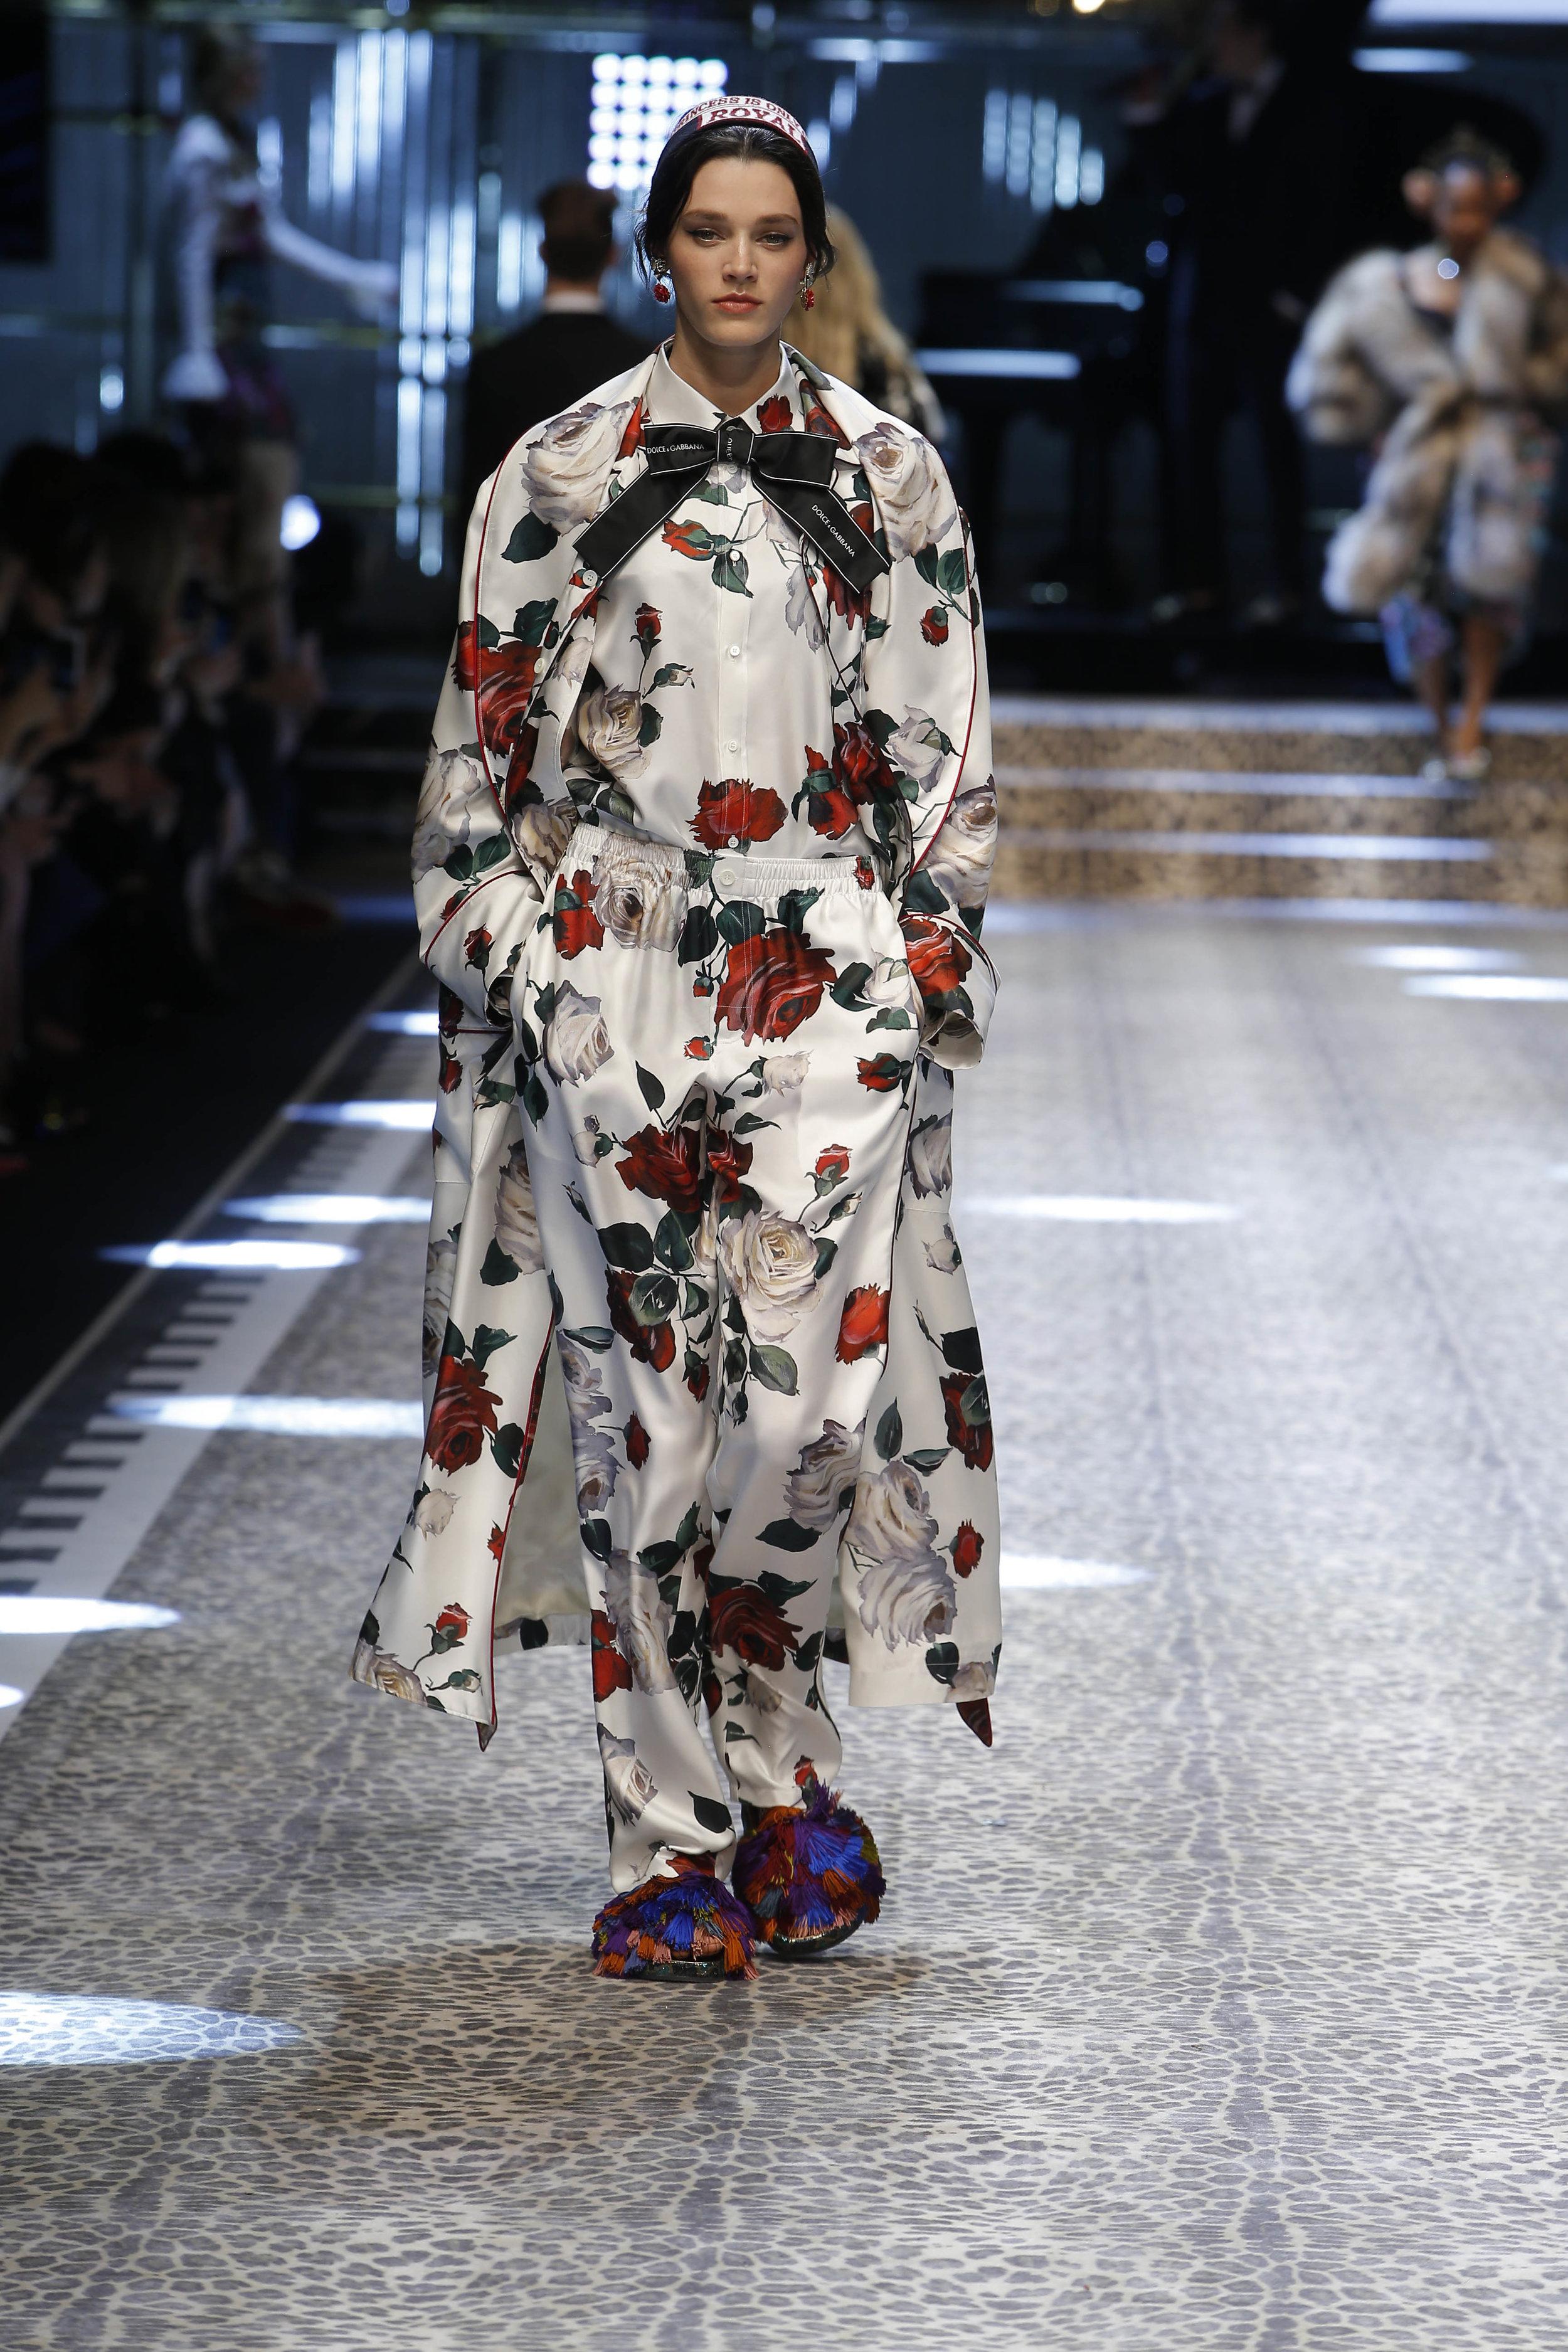 Dolce&Gabbana_women's fashion show fw17-18_Runway_images (19).jpg